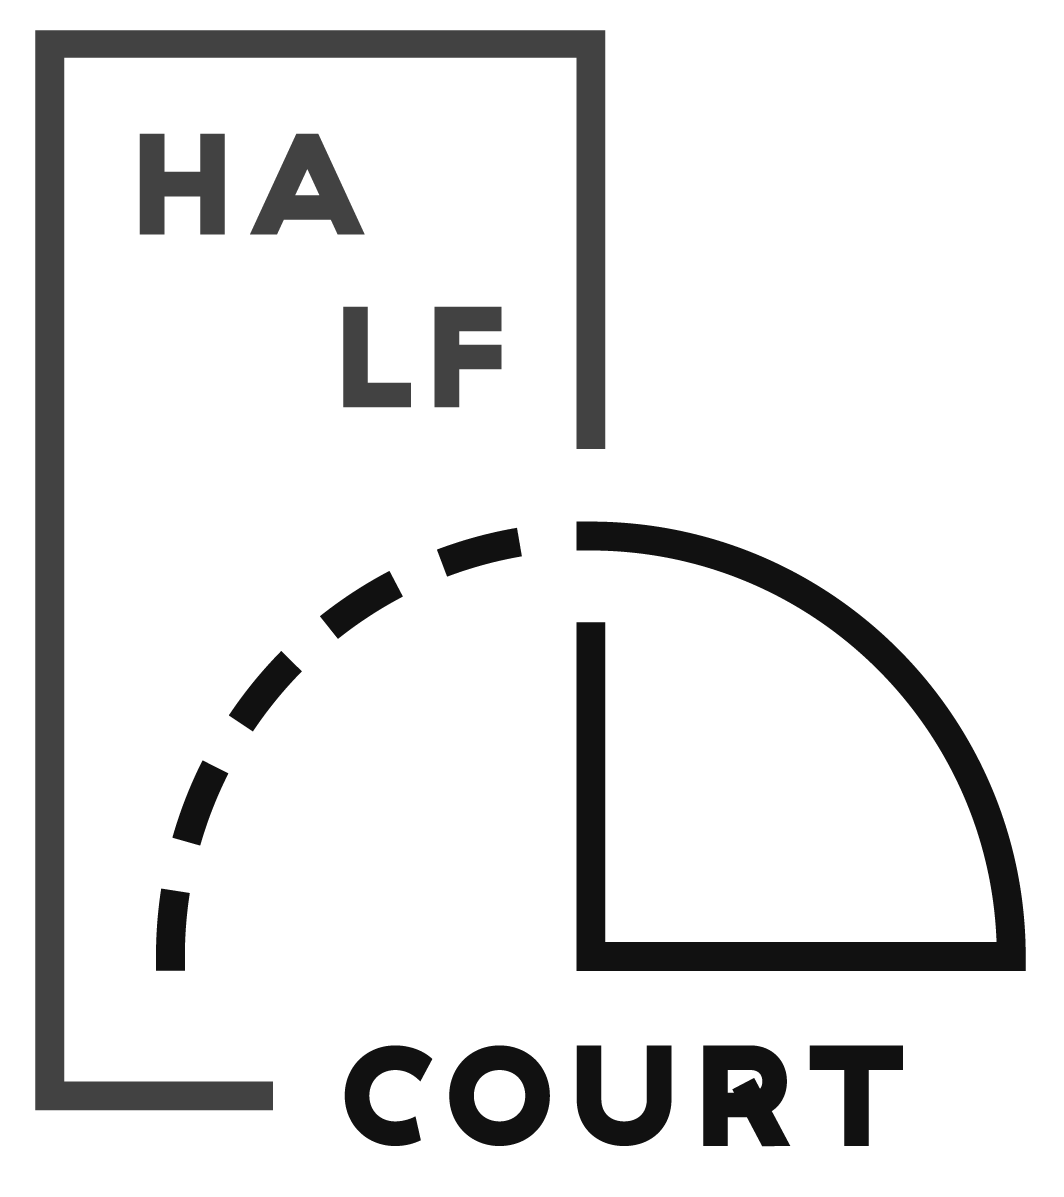 HalfCourtLogo.png